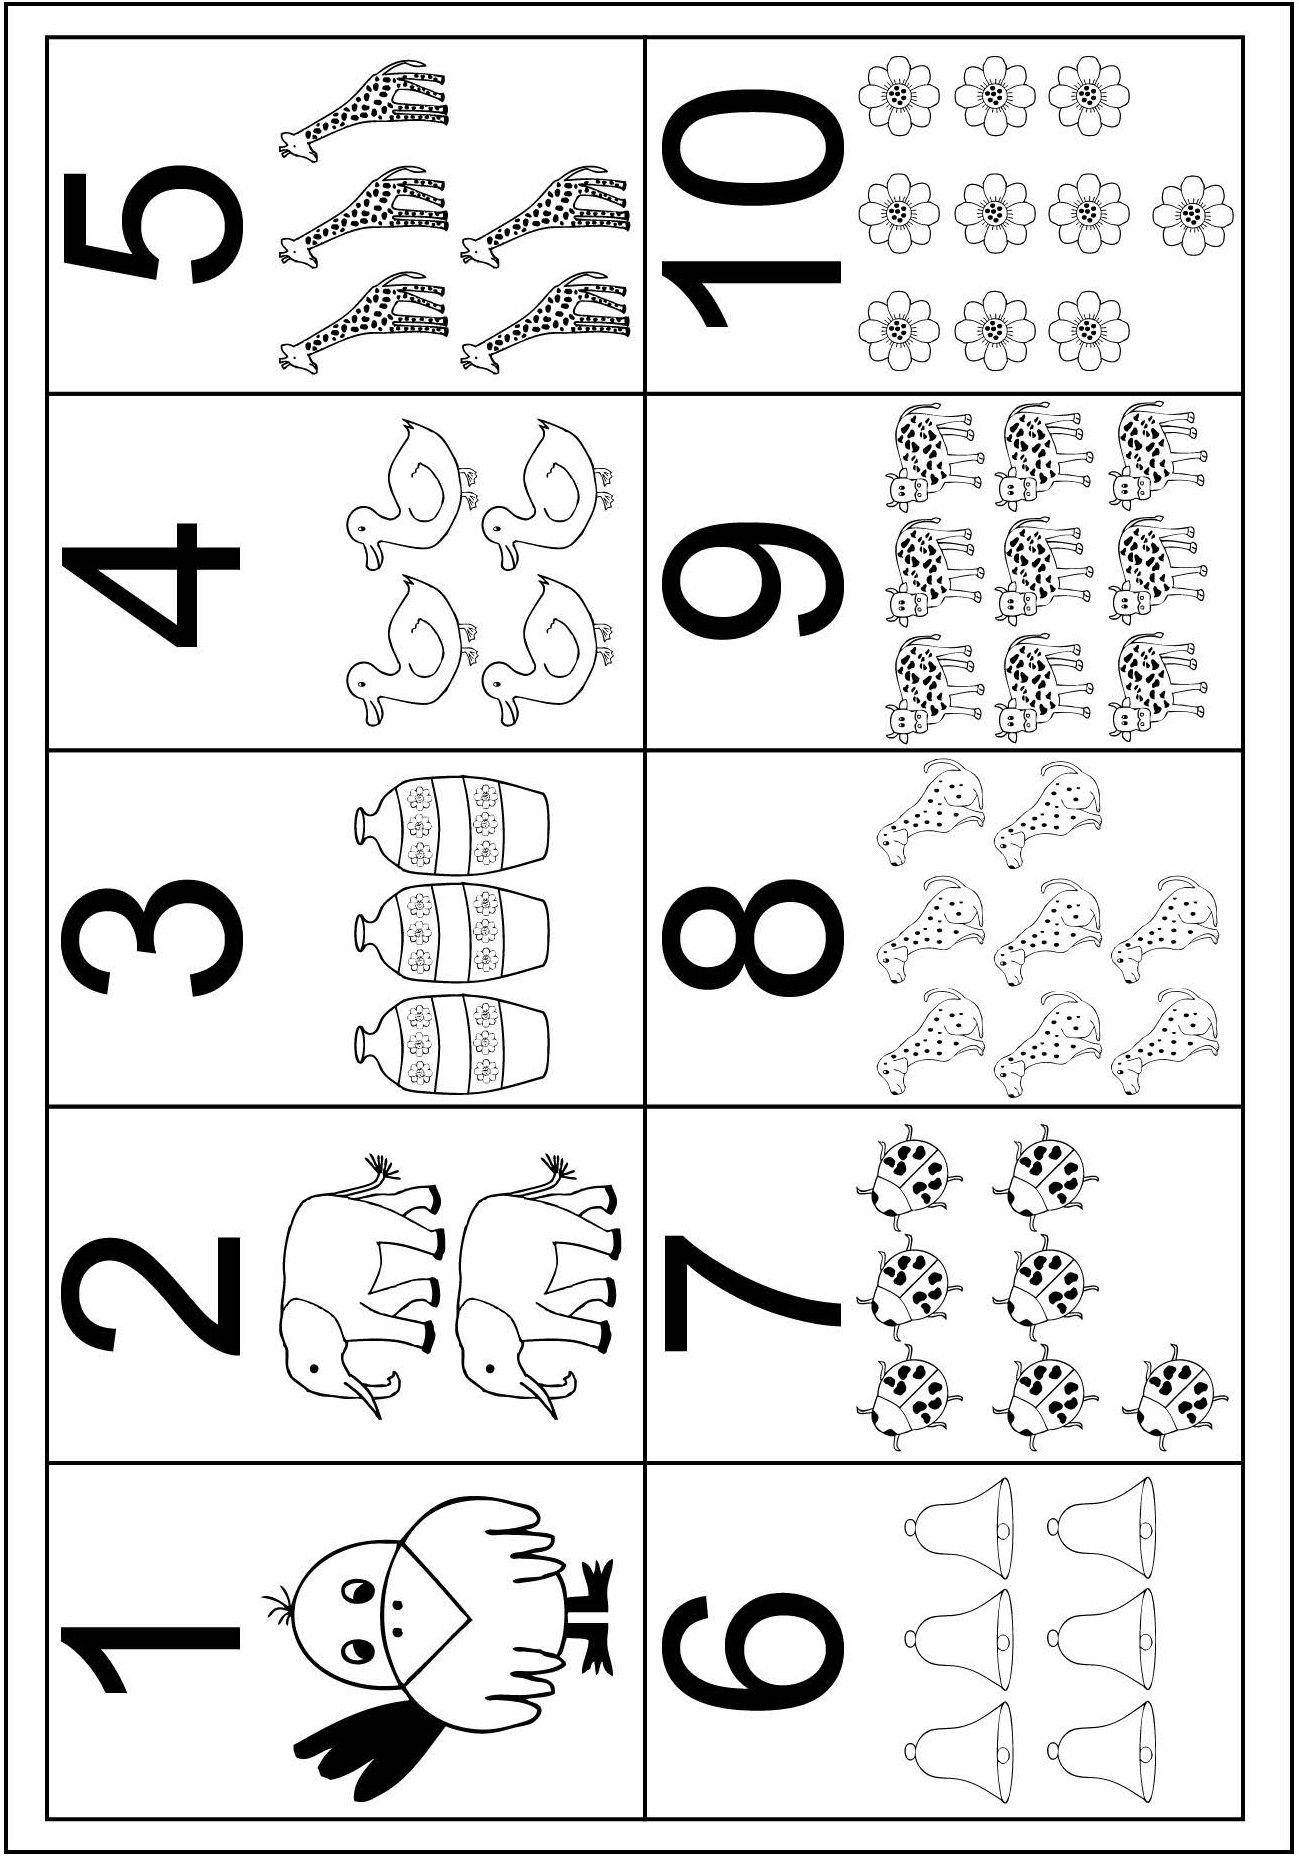 números até 10 | Matemática | Pinterest | Math, Numeracy and School